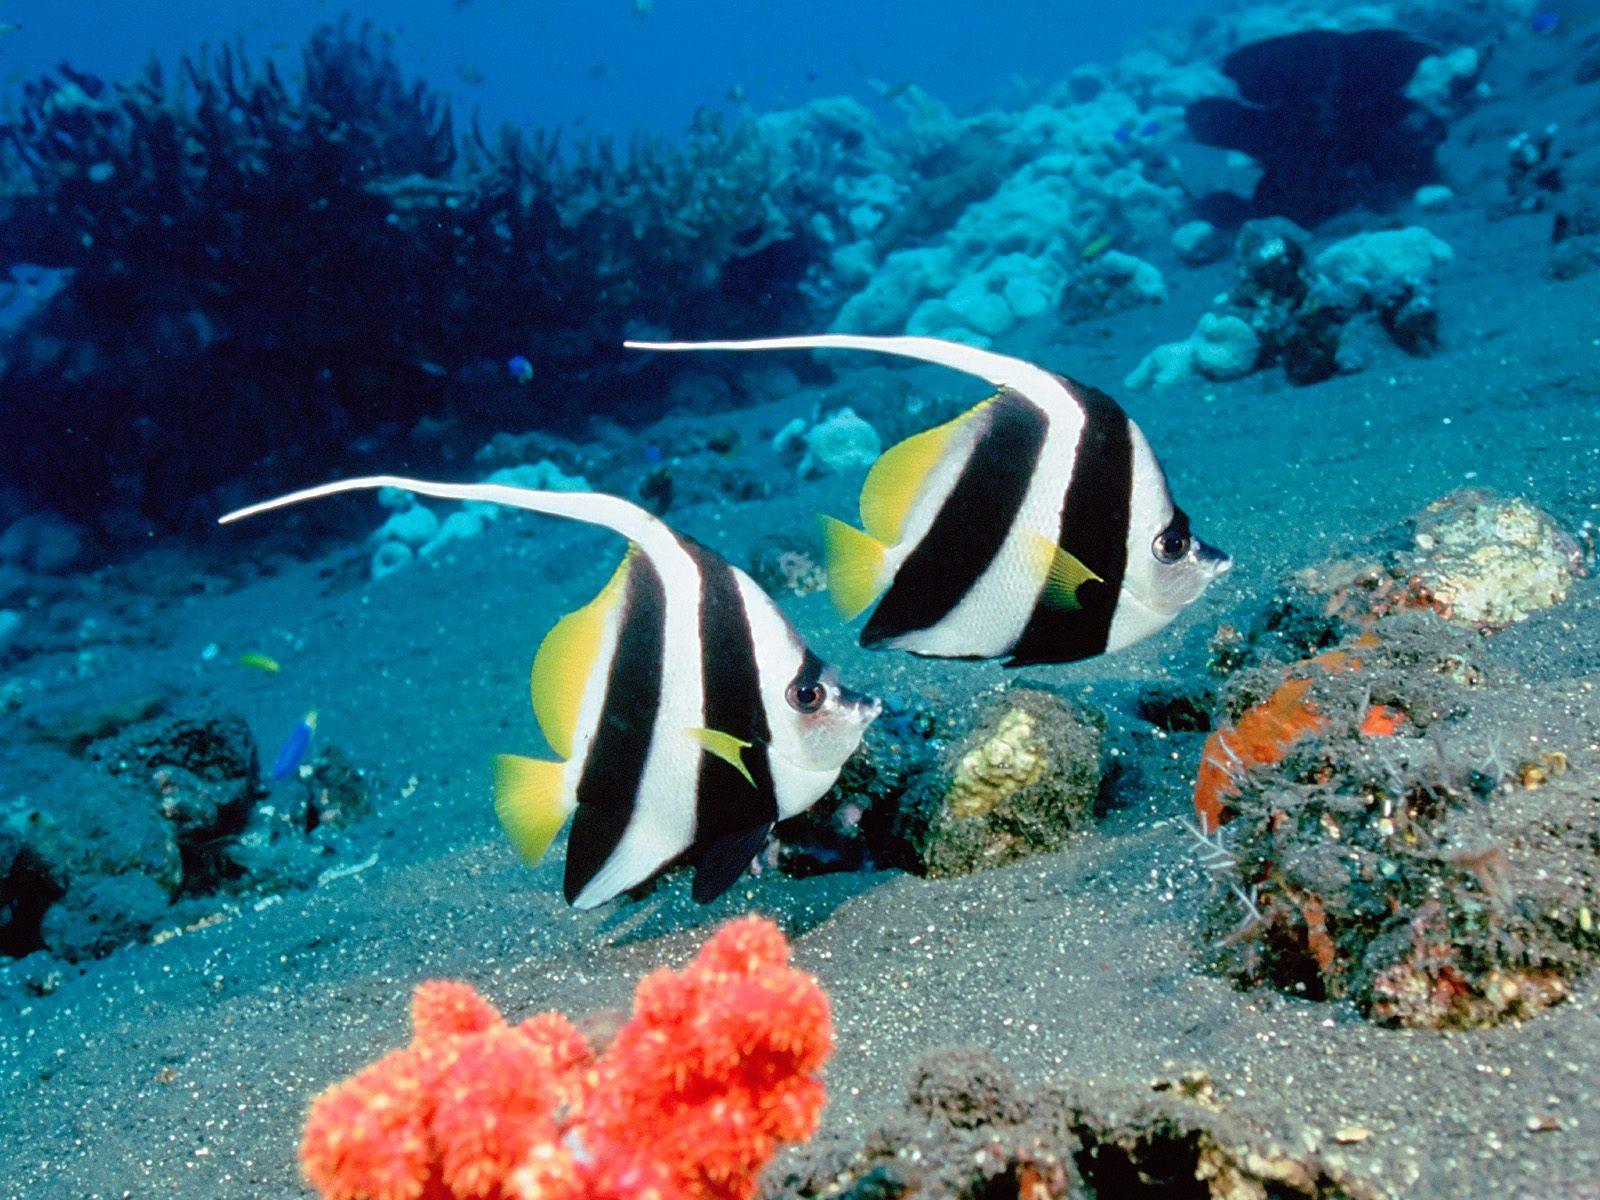 Free Download Best Wallpapers Underwater Wallpapers Hd